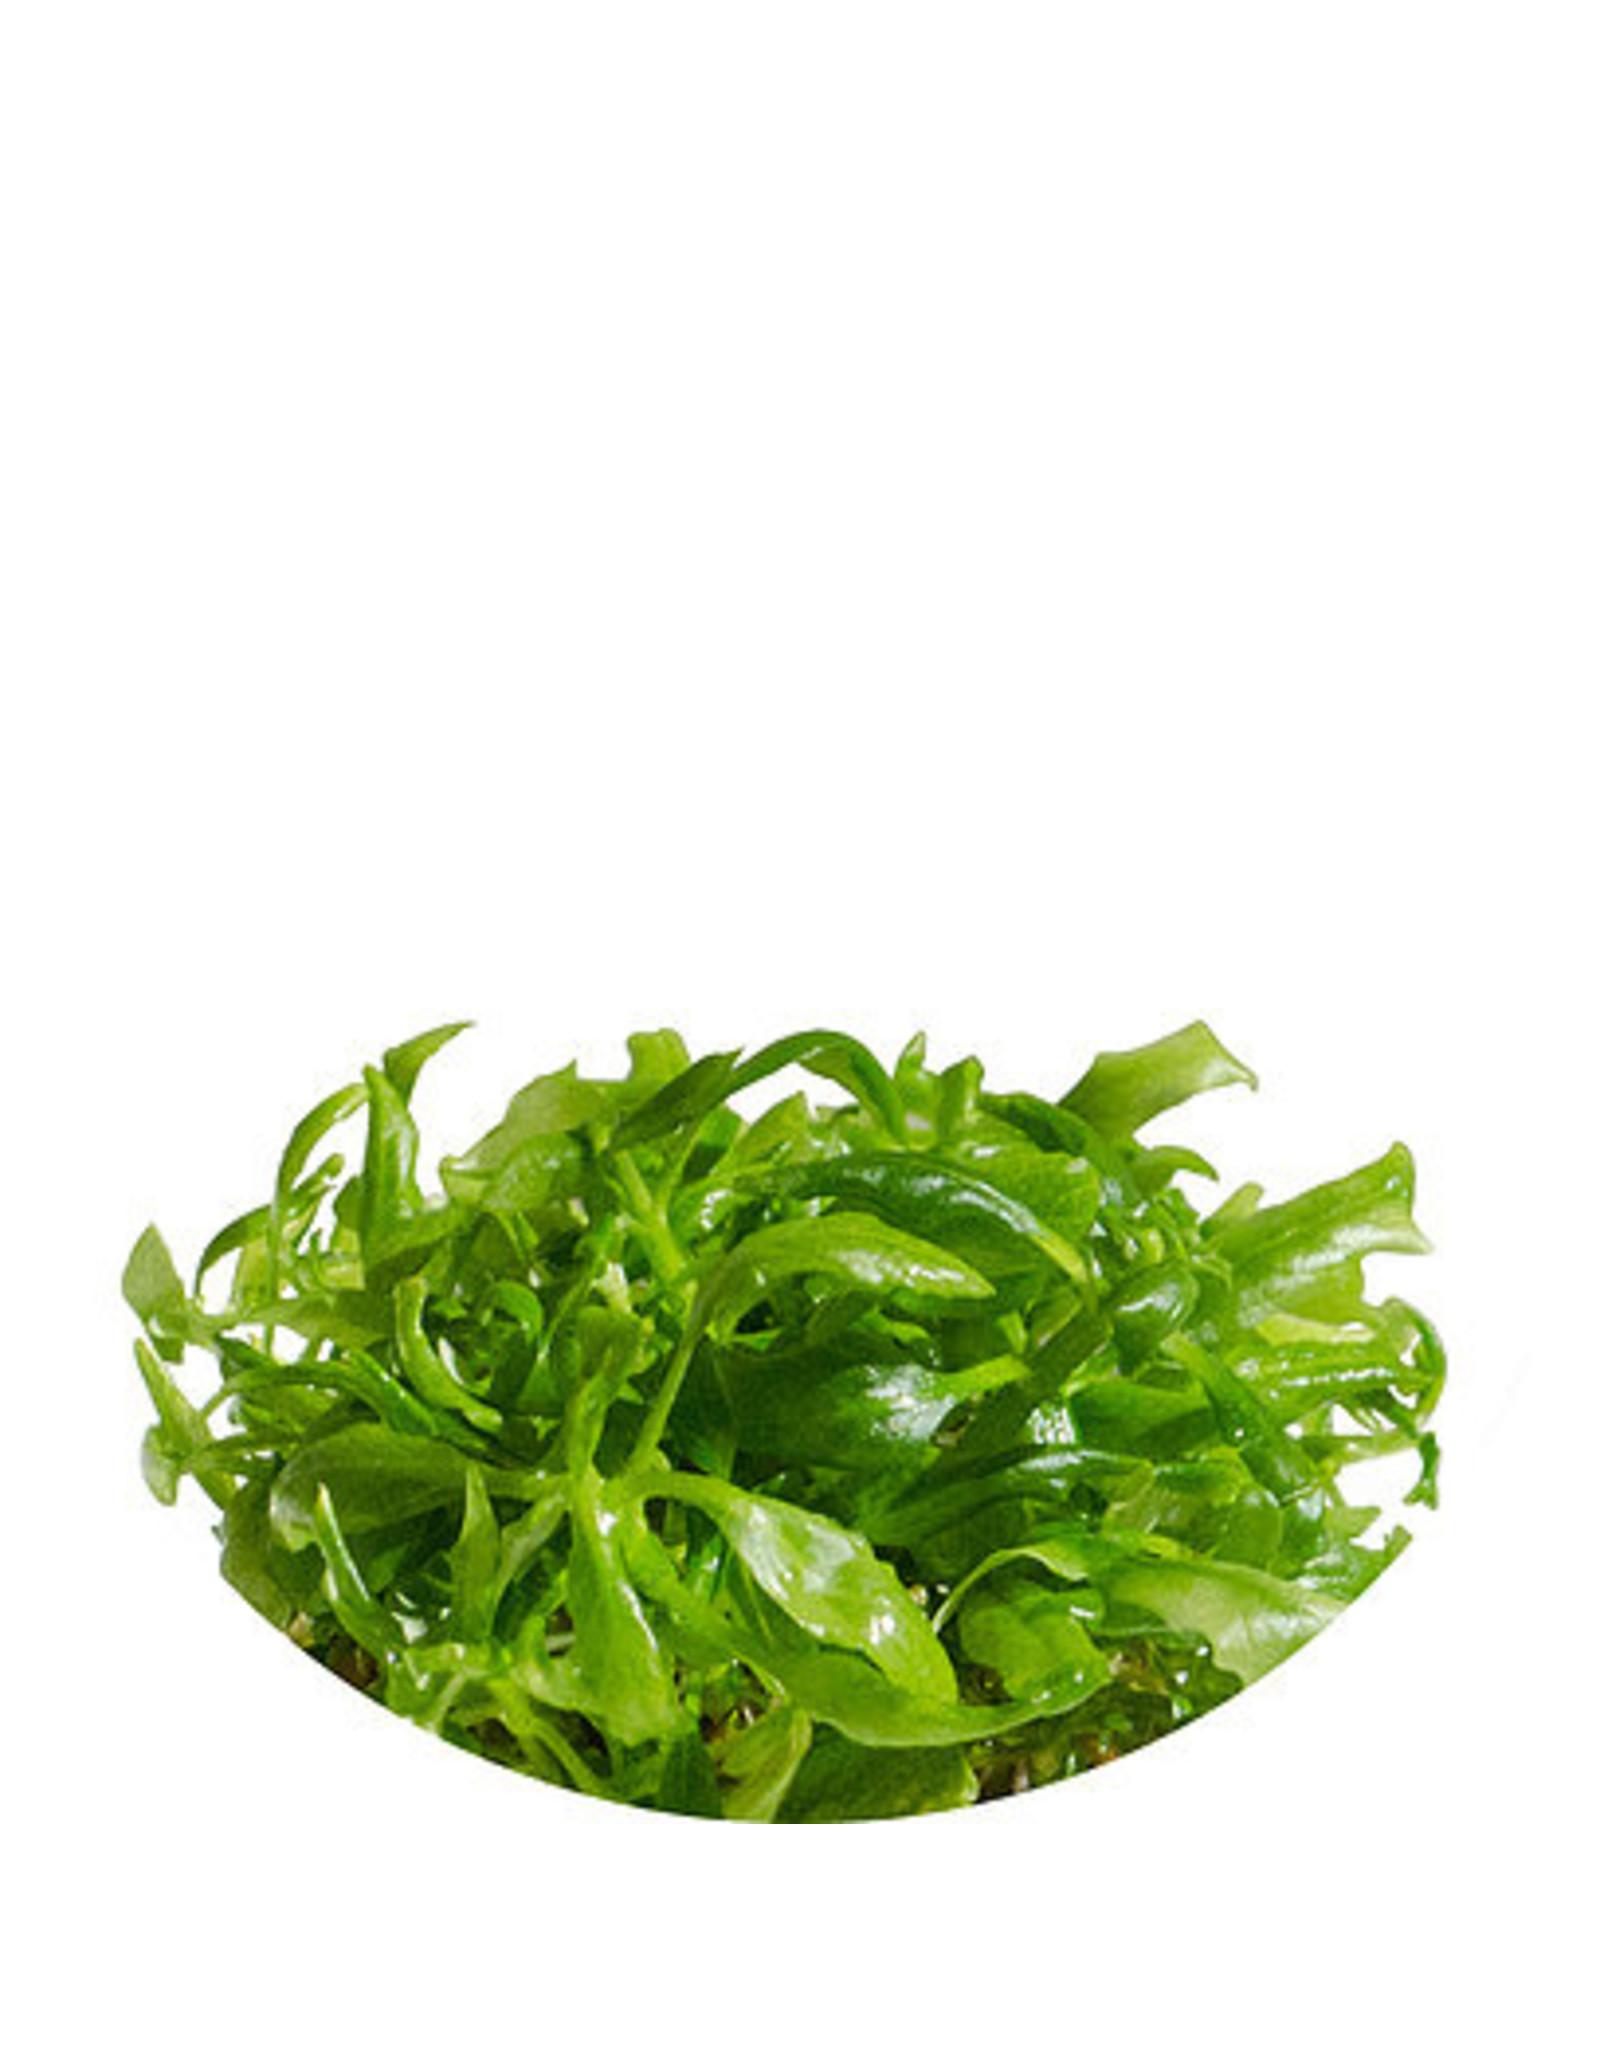 ABC Plants ABC PLANTS - Hygrophila difformis - Water Wisteria